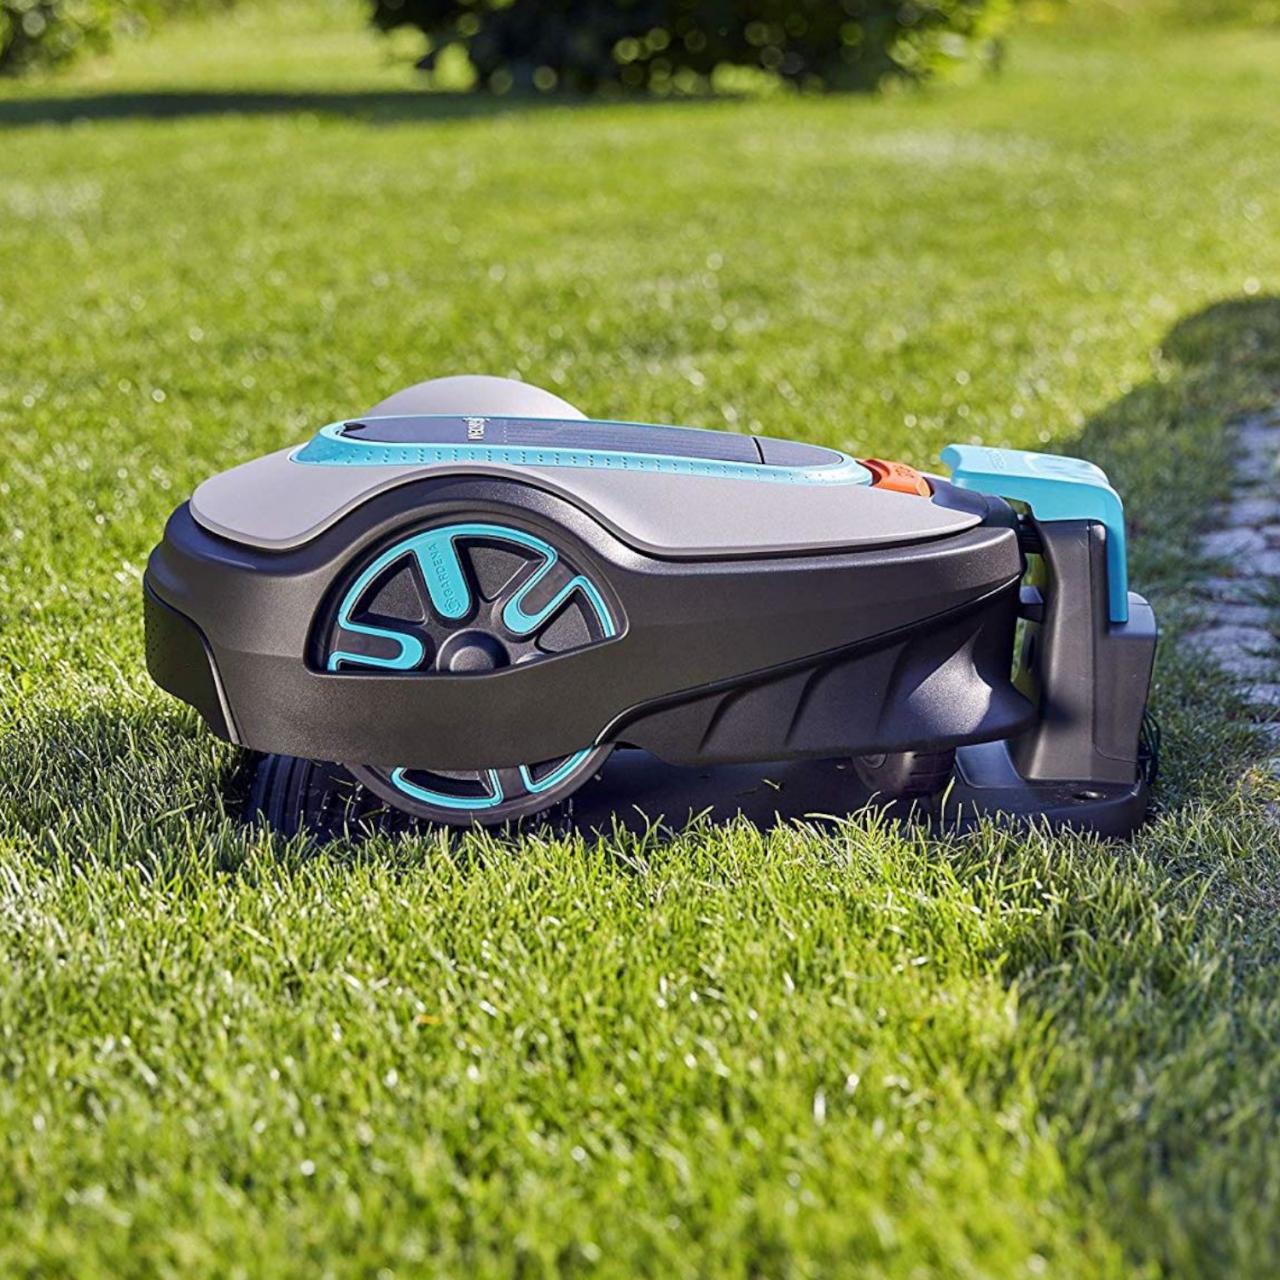 Gardena 15101-20 SILENO life Mähroboter Rasenmäher Roboter bis zu 750m² Garten